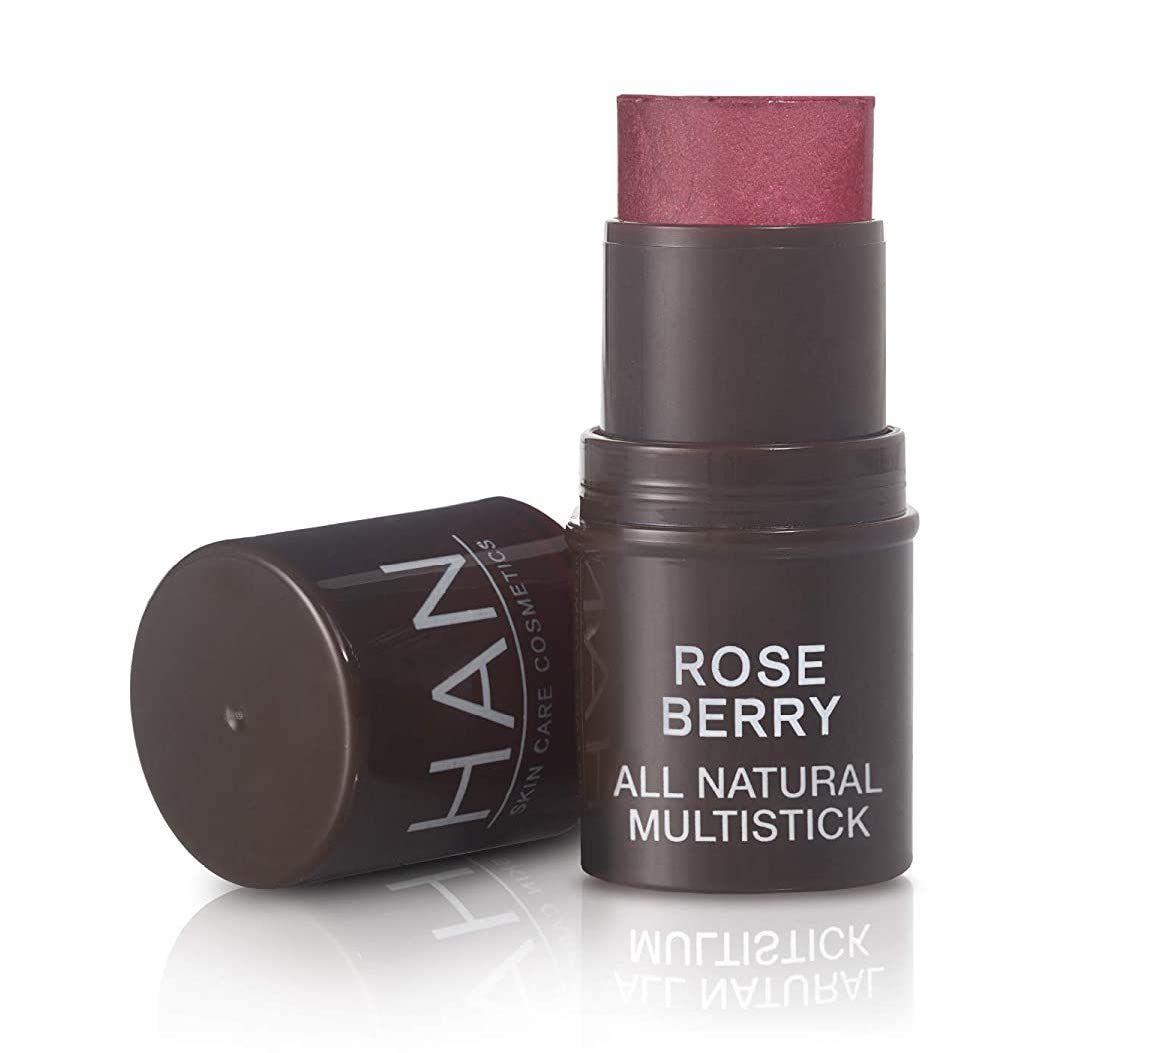 HAN All Natural Multistick Cheek and Lip Tint